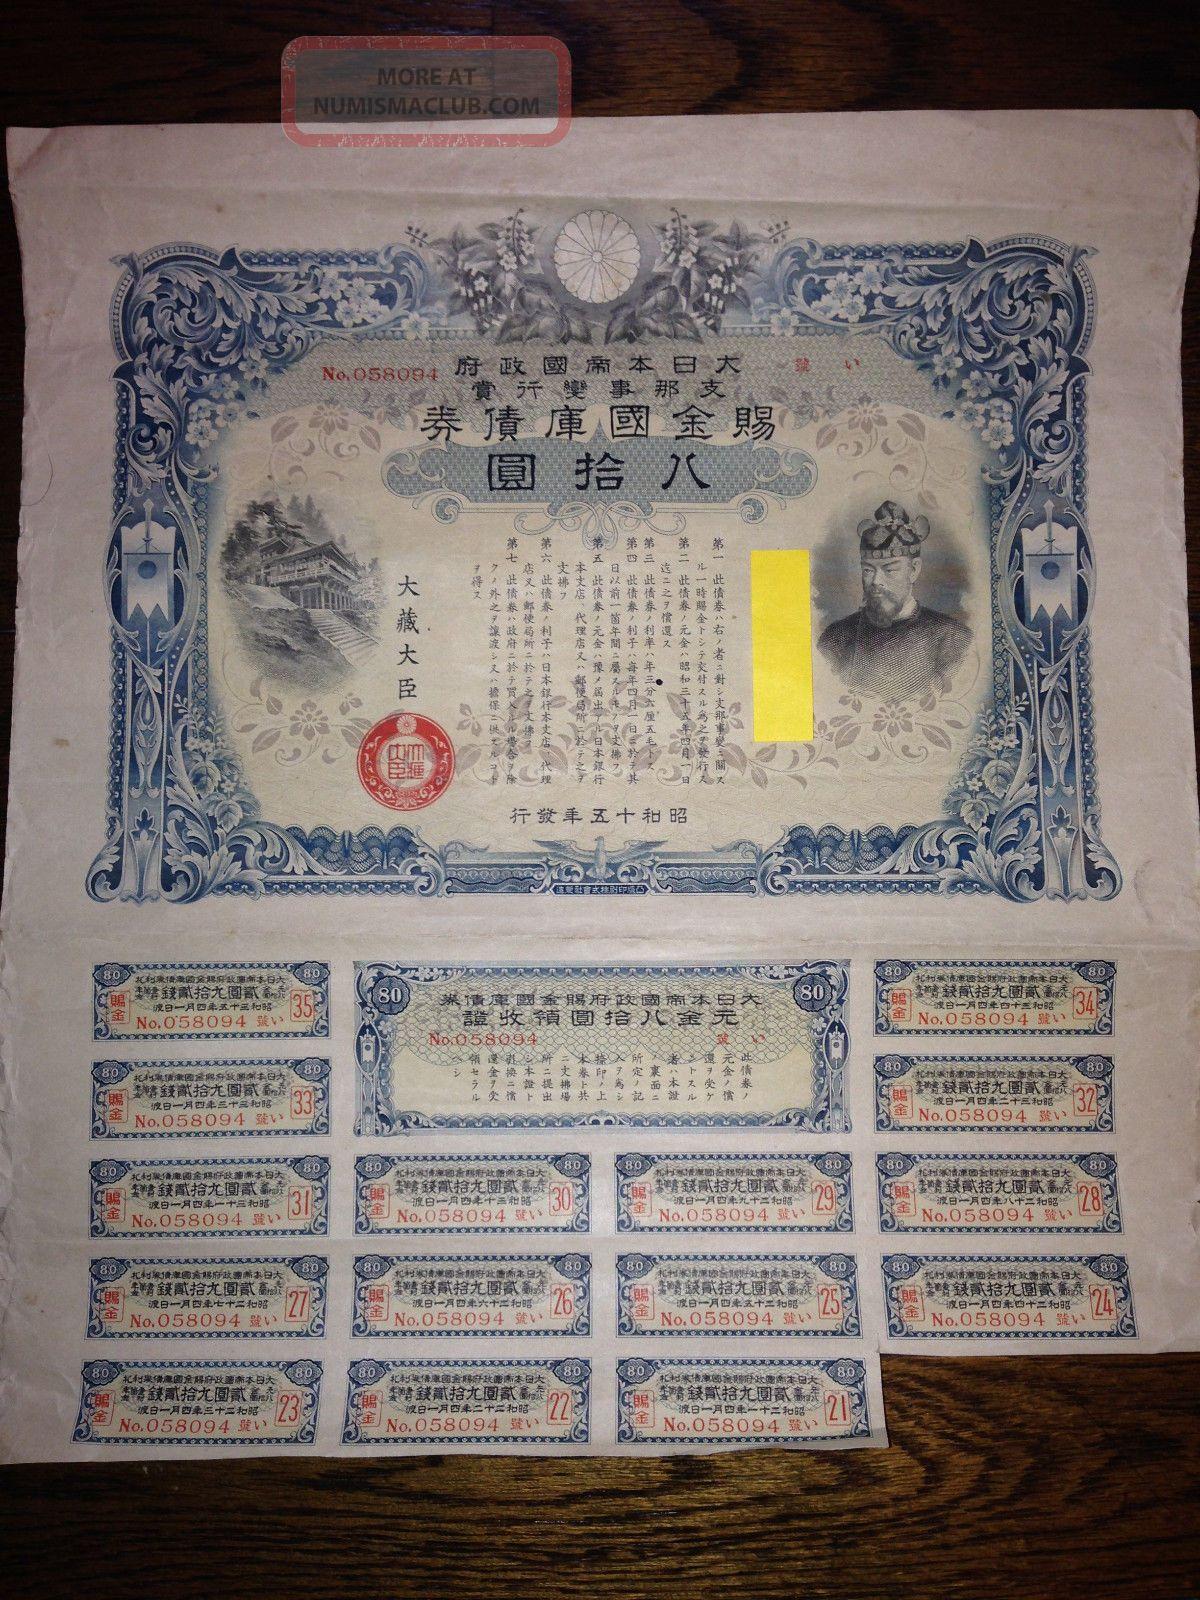 1940.  Ww2 Imperial Government Bond Of Japan.  Sino - Japanese War.  Japan - China War. Stocks & Bonds, Scripophily photo